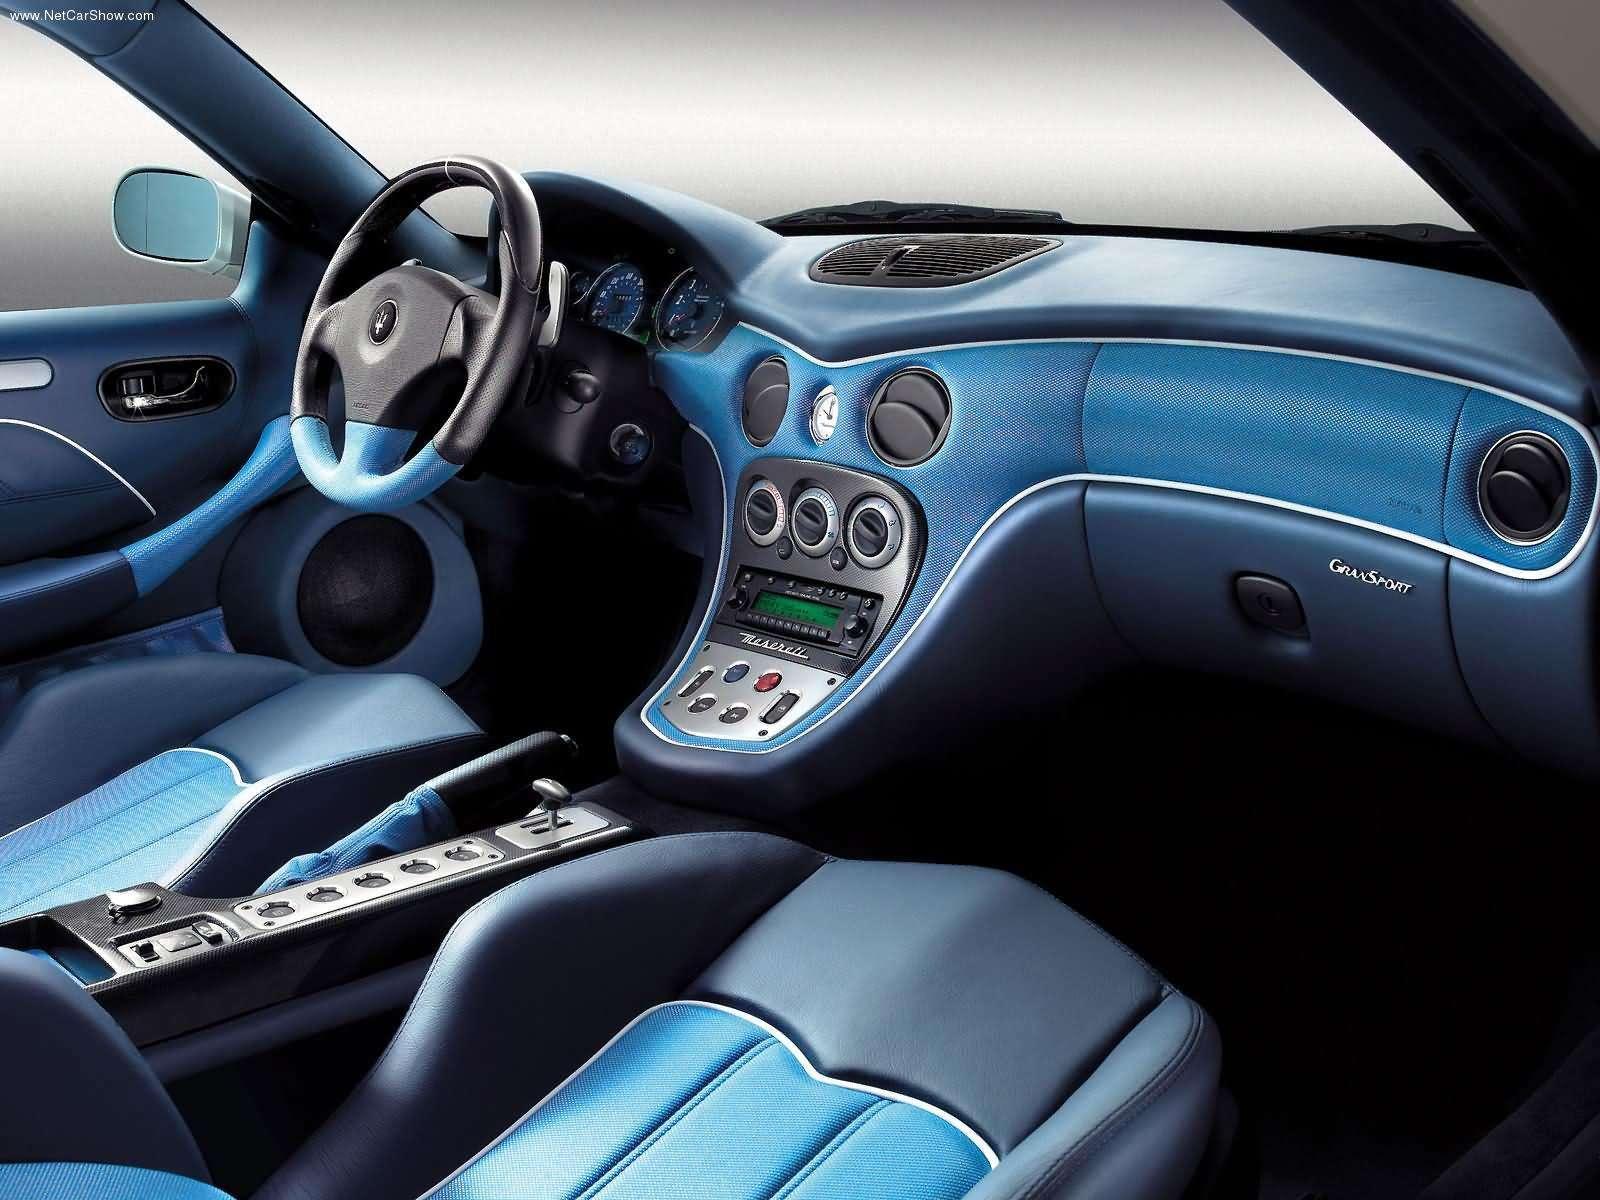 Hình ảnh siêu xe Maserati GranSport 2004 & nội ngoại thất